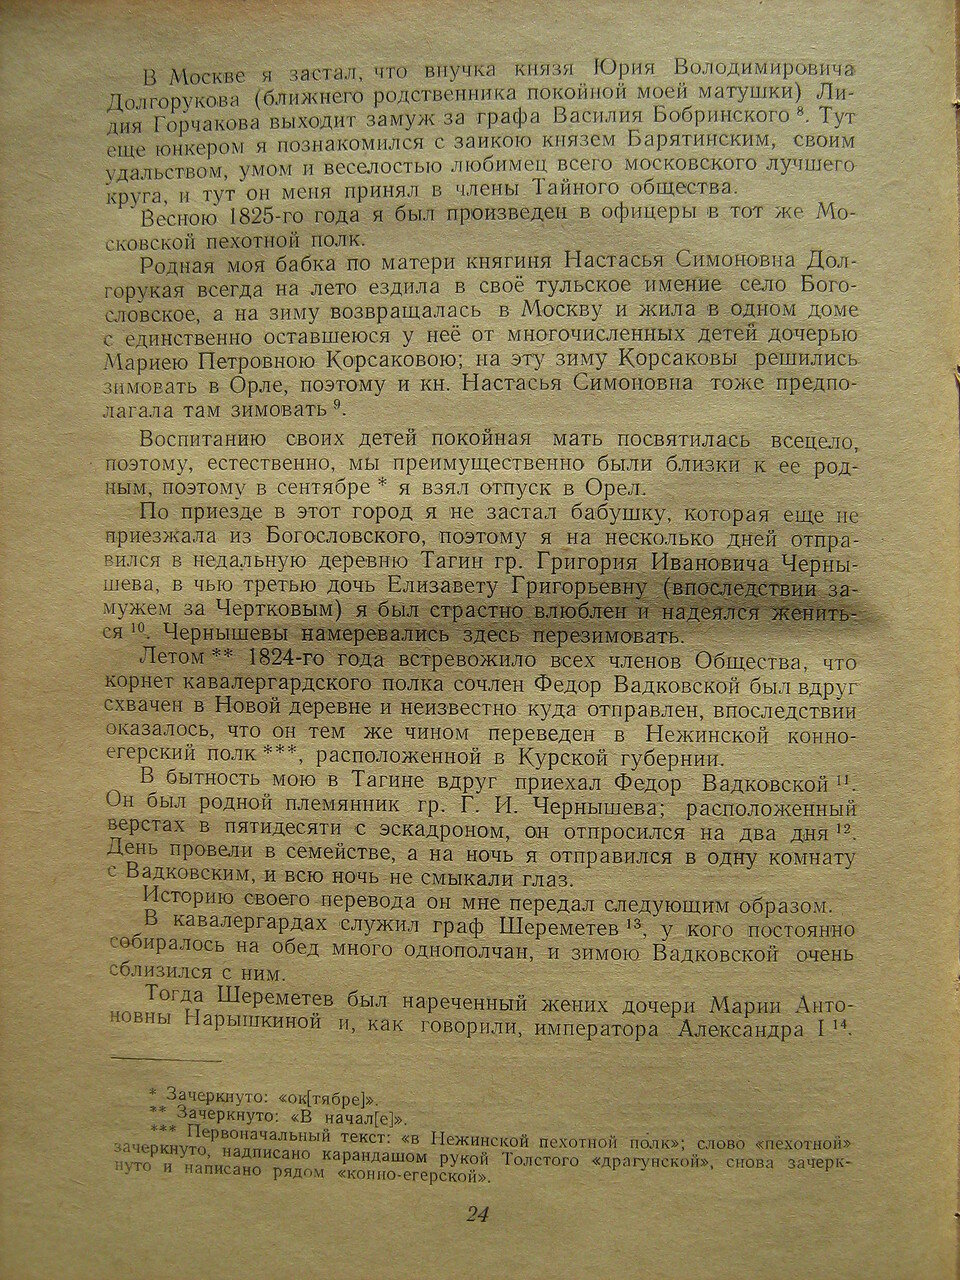 https://img-fotki.yandex.ru/get/477137/199368979.de/0_21f747_5e3d2ab4_XXXL.jpg